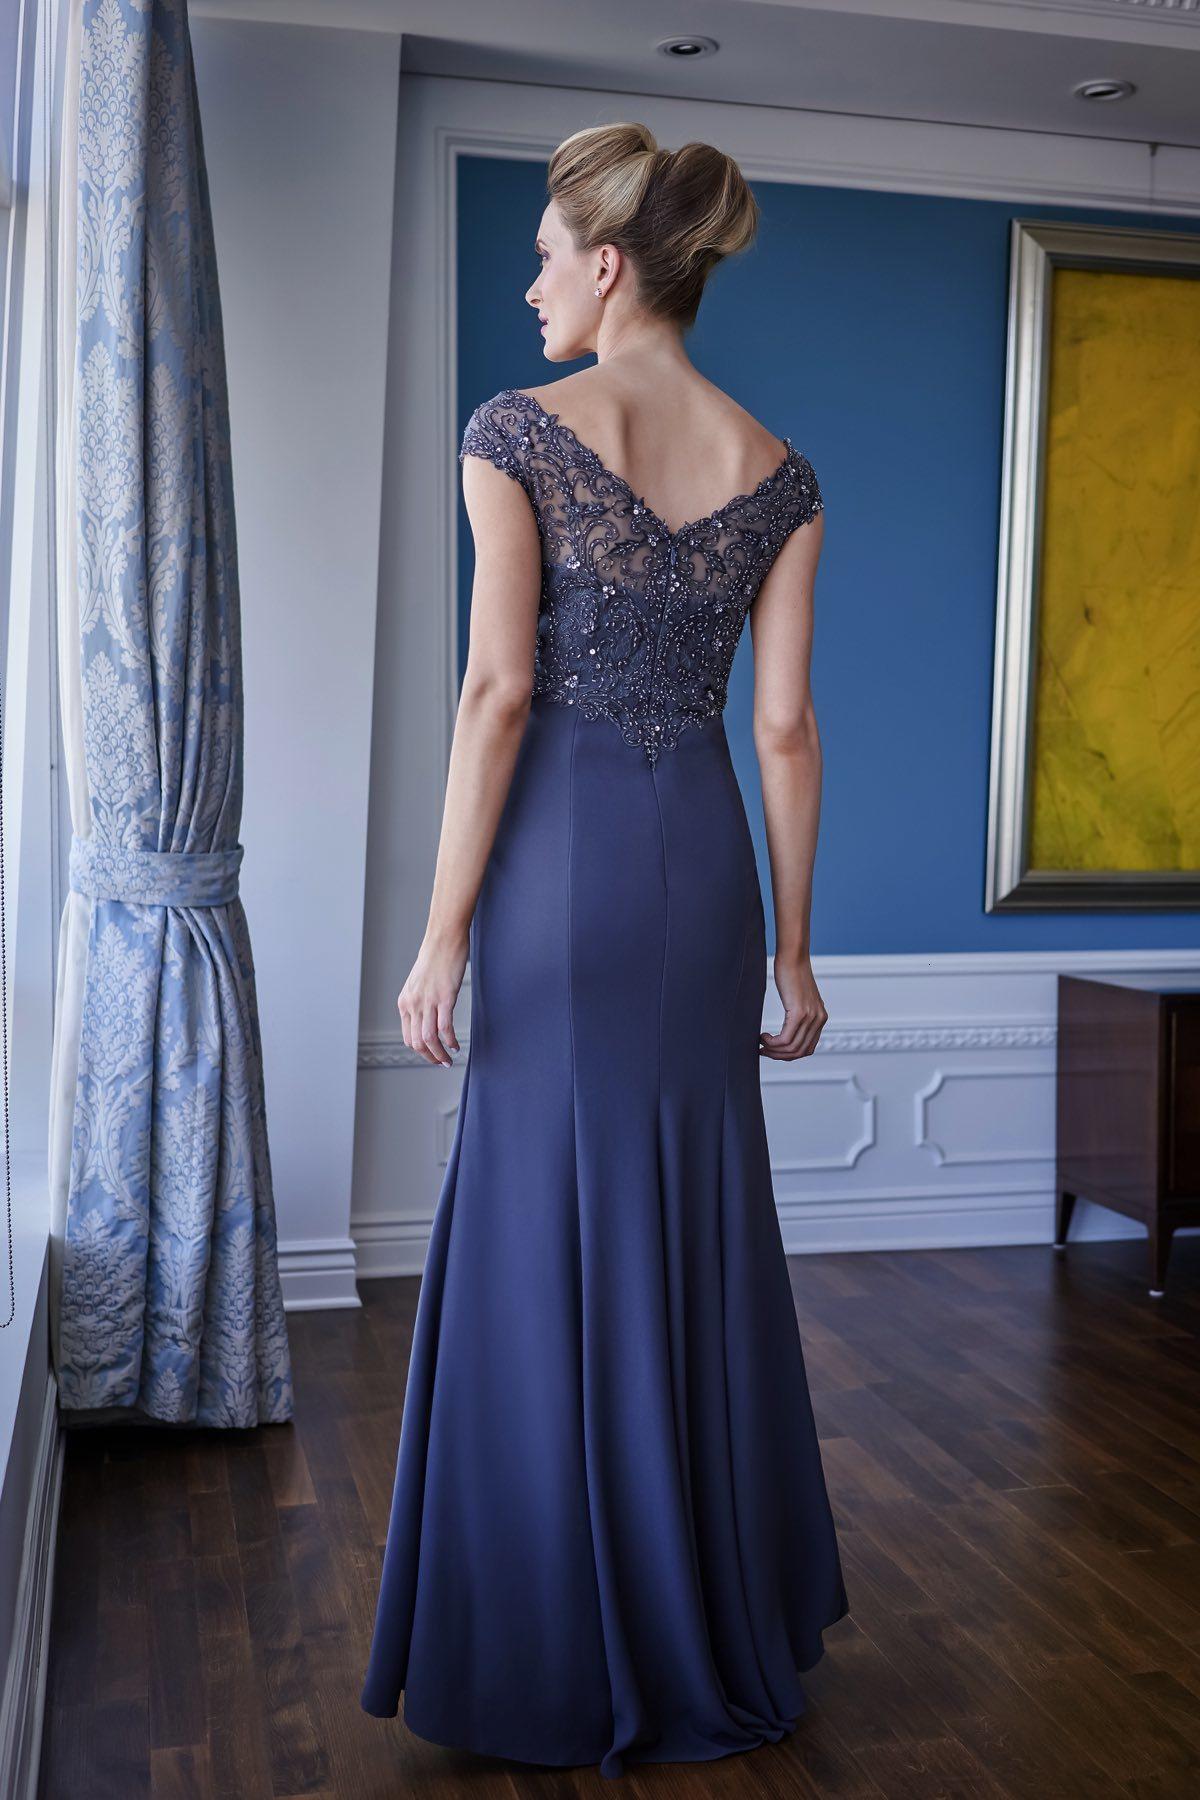 Sheath Mother Of The Bridal Dresses V Neck Capped Beaded Chiffon Prom Dress Floor Length Mothers Dresses